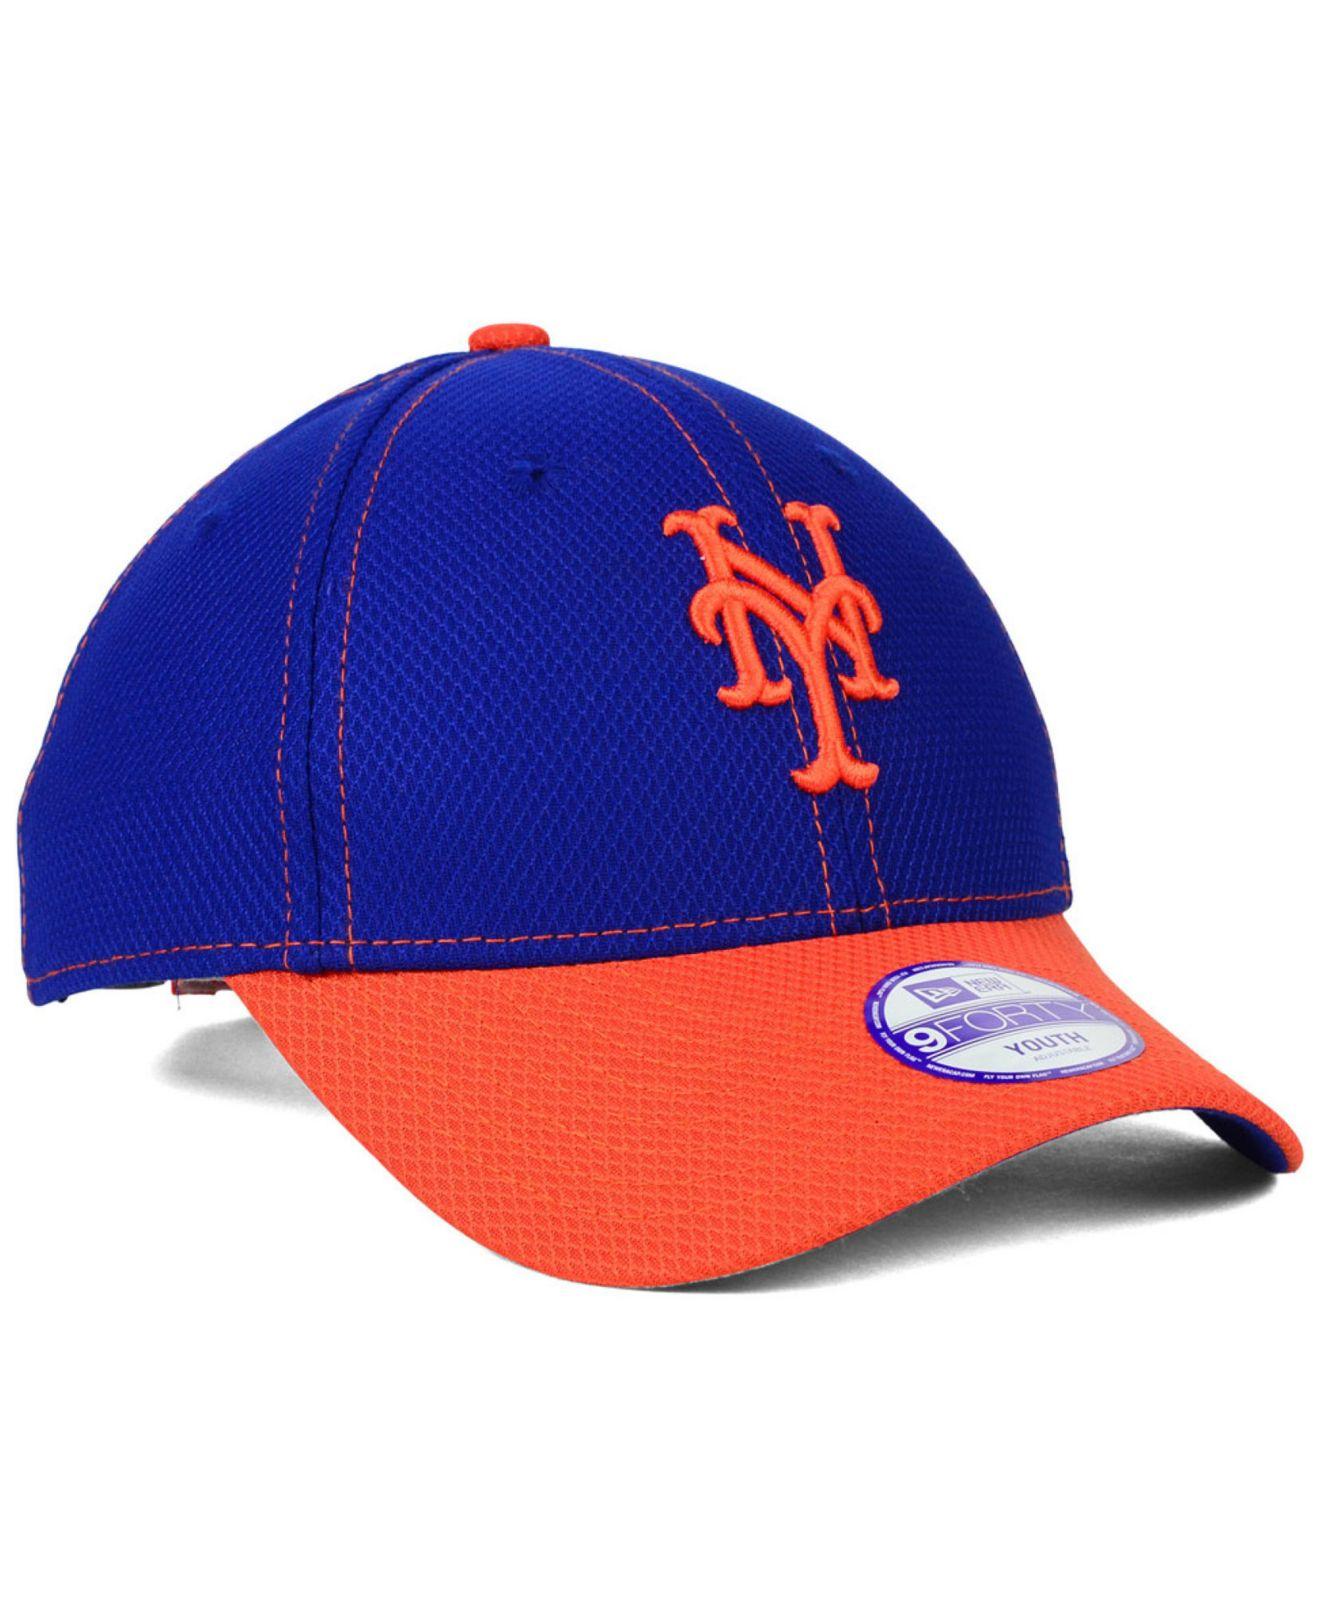 98f2bf5e9 ... italy bucket hats booney safari hats at fansedge ktz kids new york mets  junior fundamental 9forty